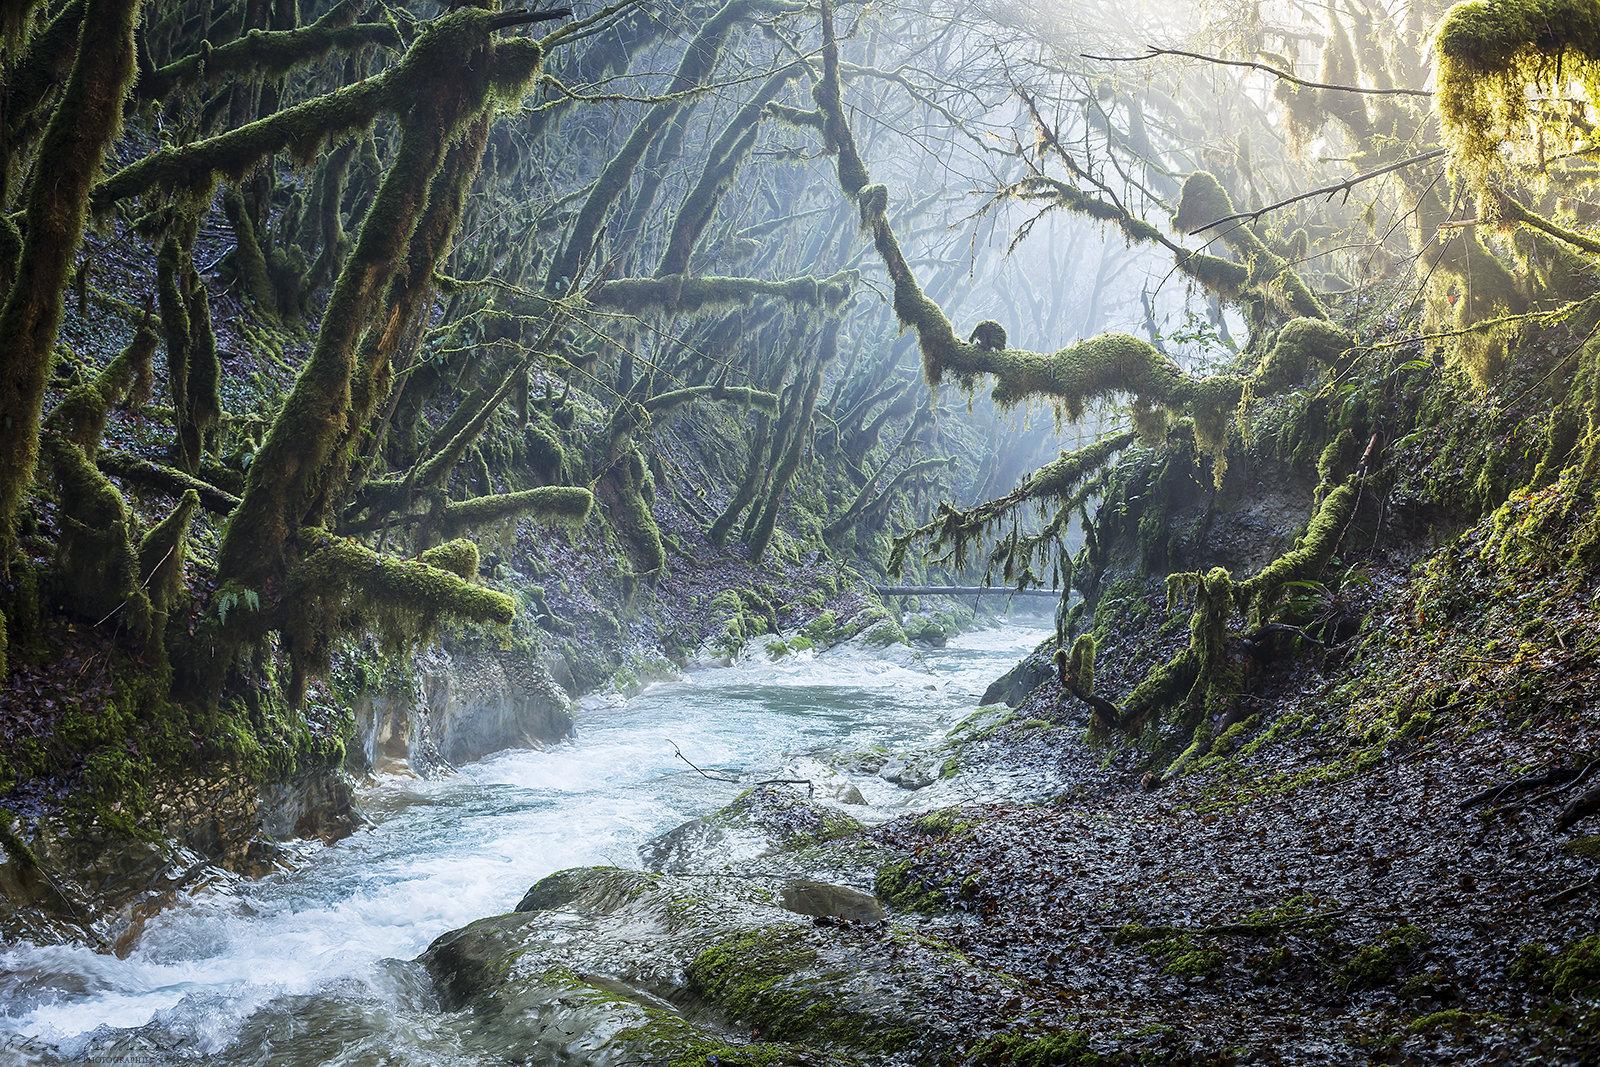 elise-julliard-photographe-rhone-alpes-ain-bugey-foret-mousse-riviere-photo